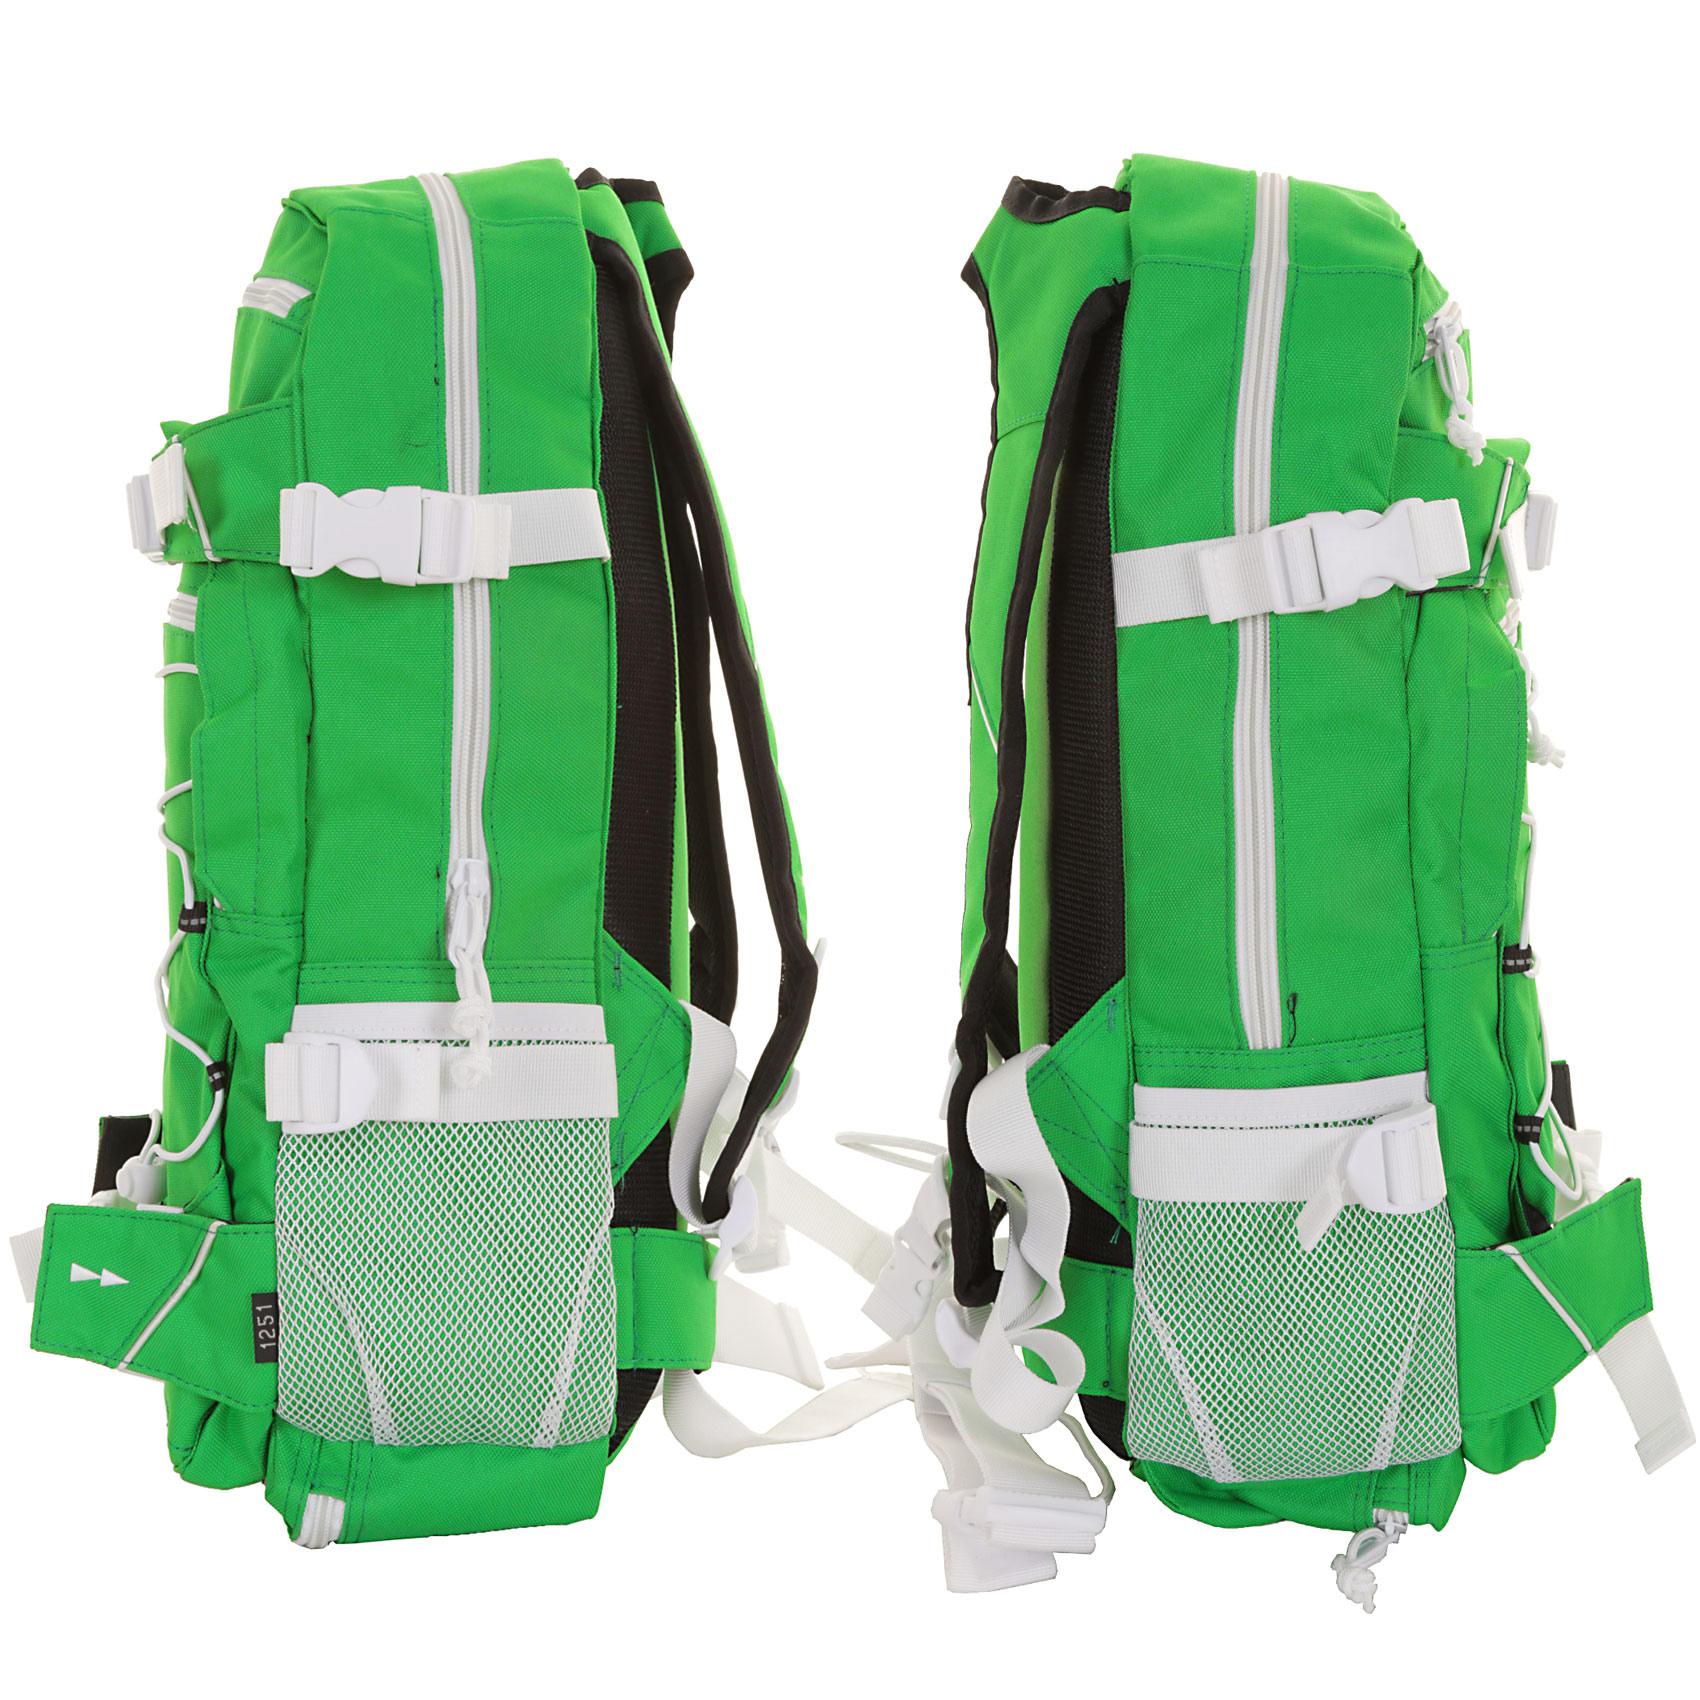 forvert ice louis rucksack 20l green kaufen bei skatedeluxe. Black Bedroom Furniture Sets. Home Design Ideas